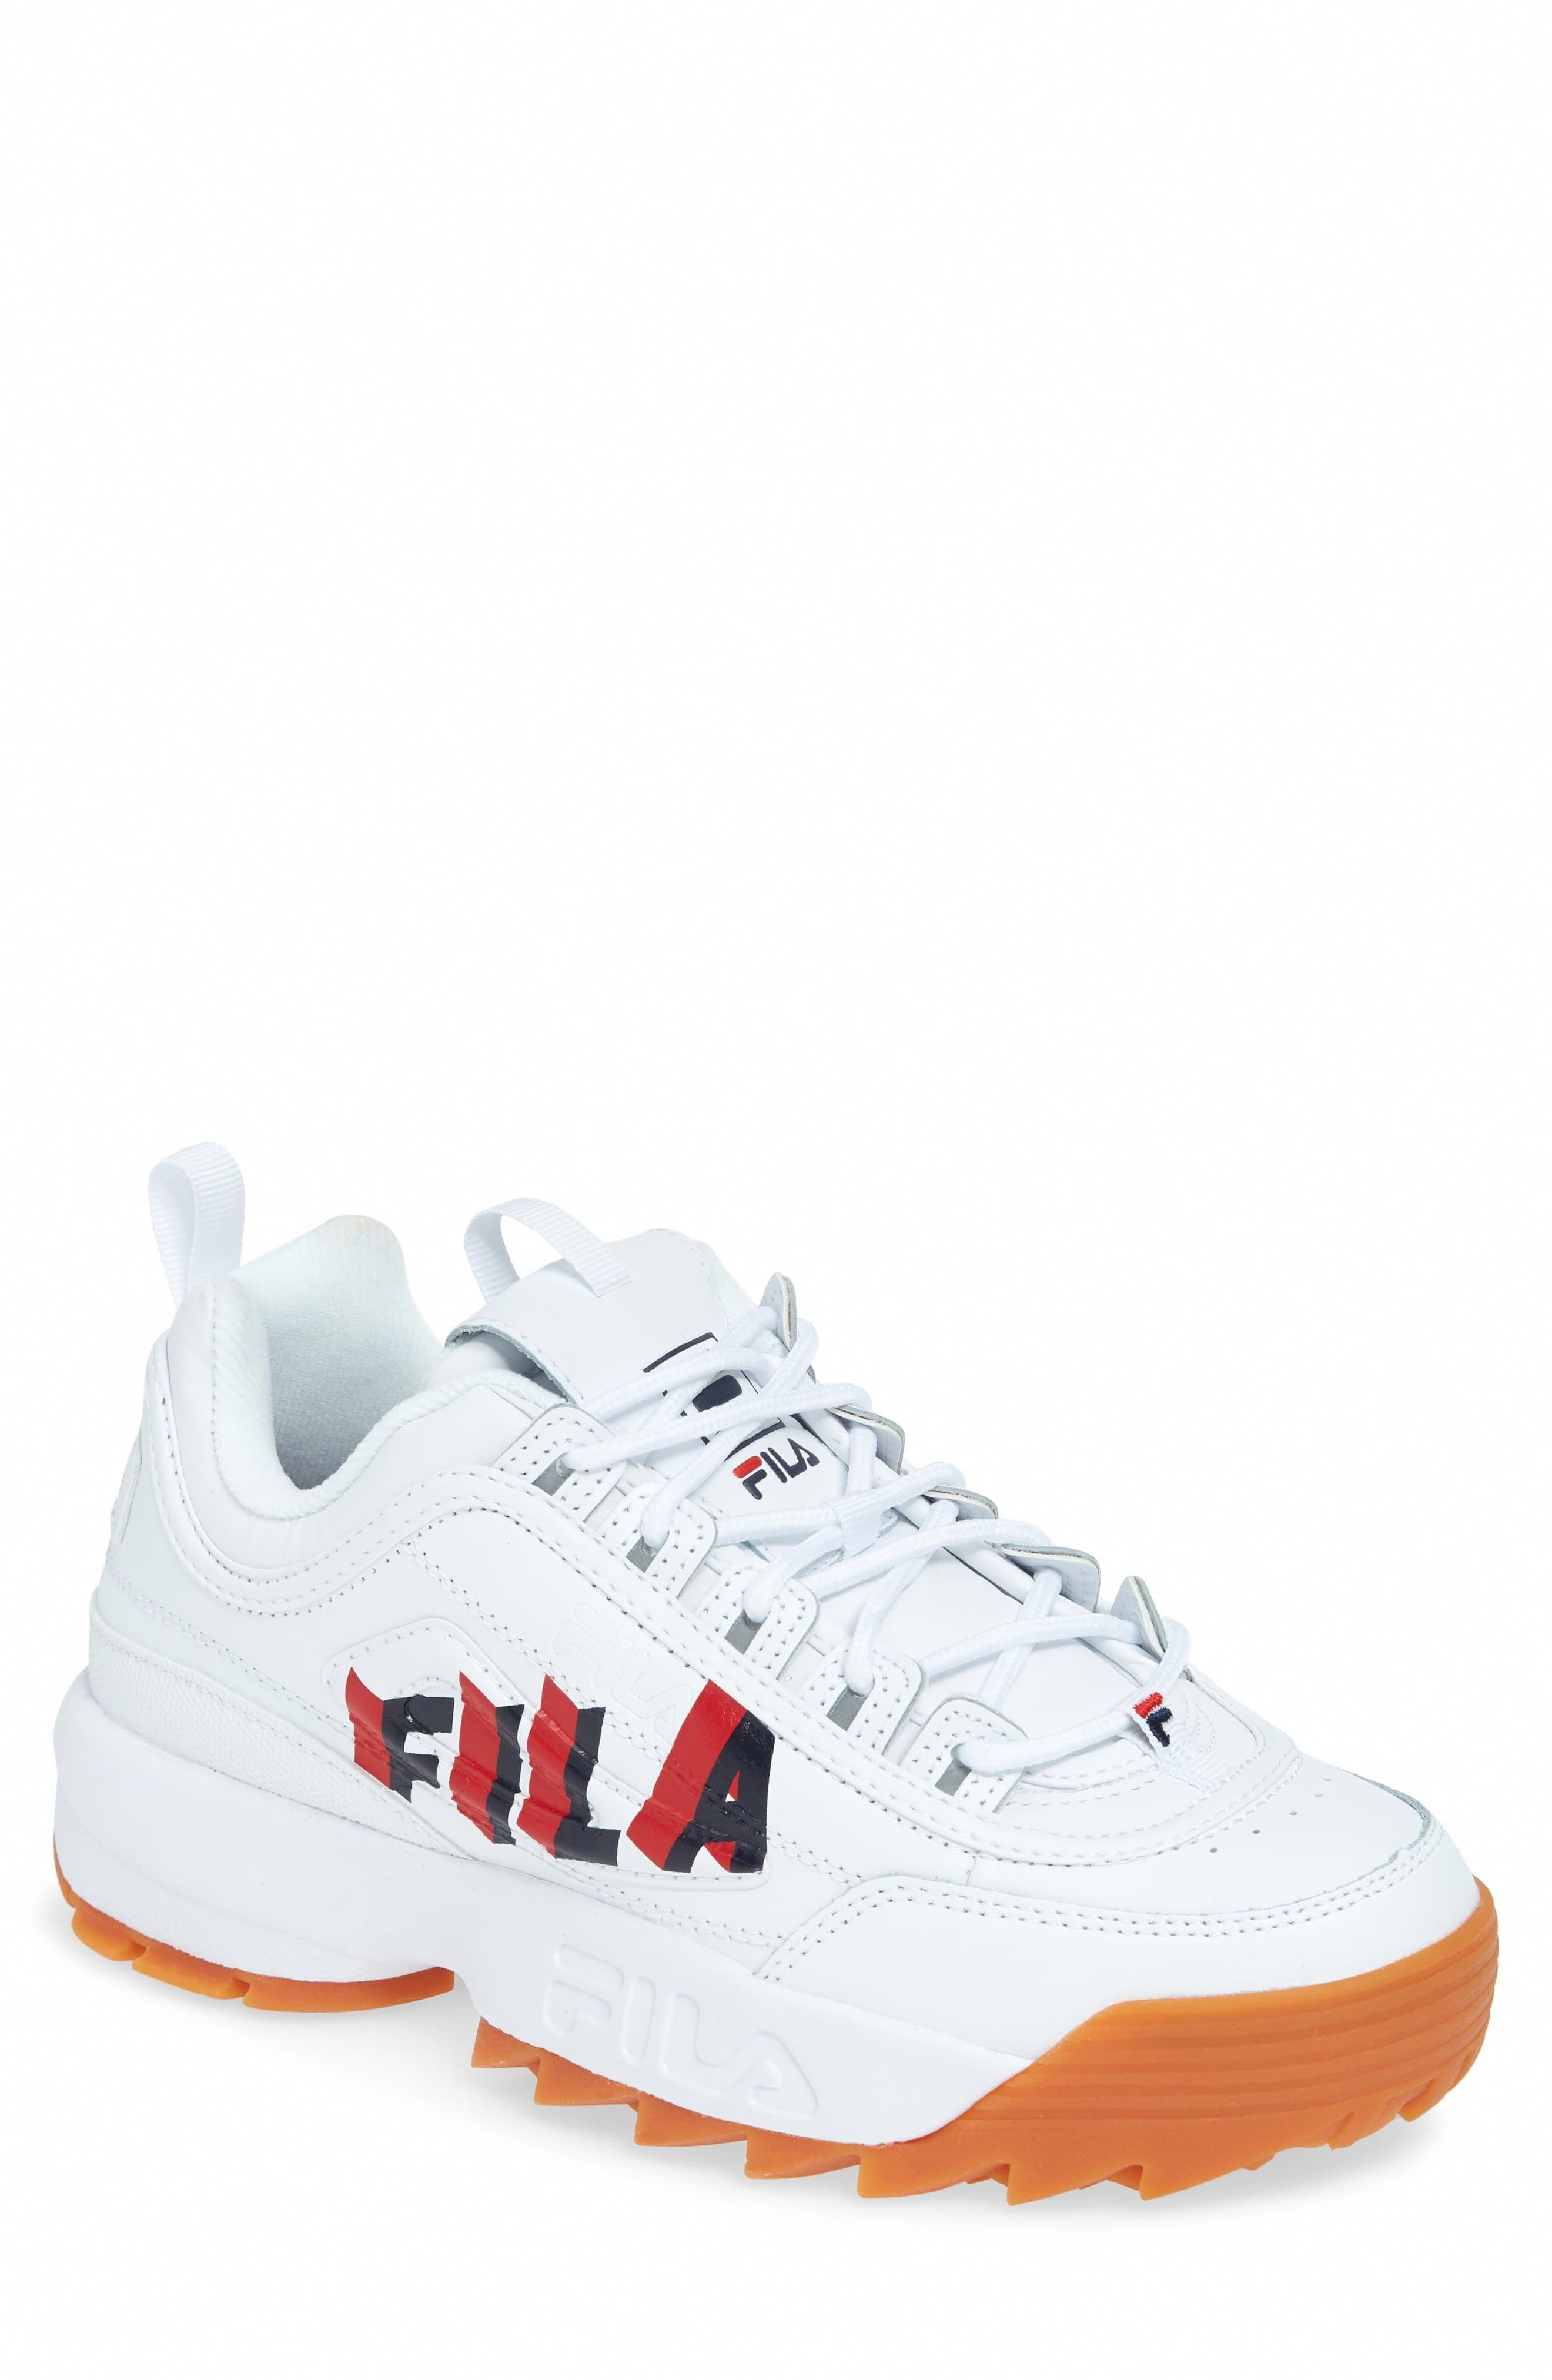 Fila Disruptor Ii Perspective Sneaker